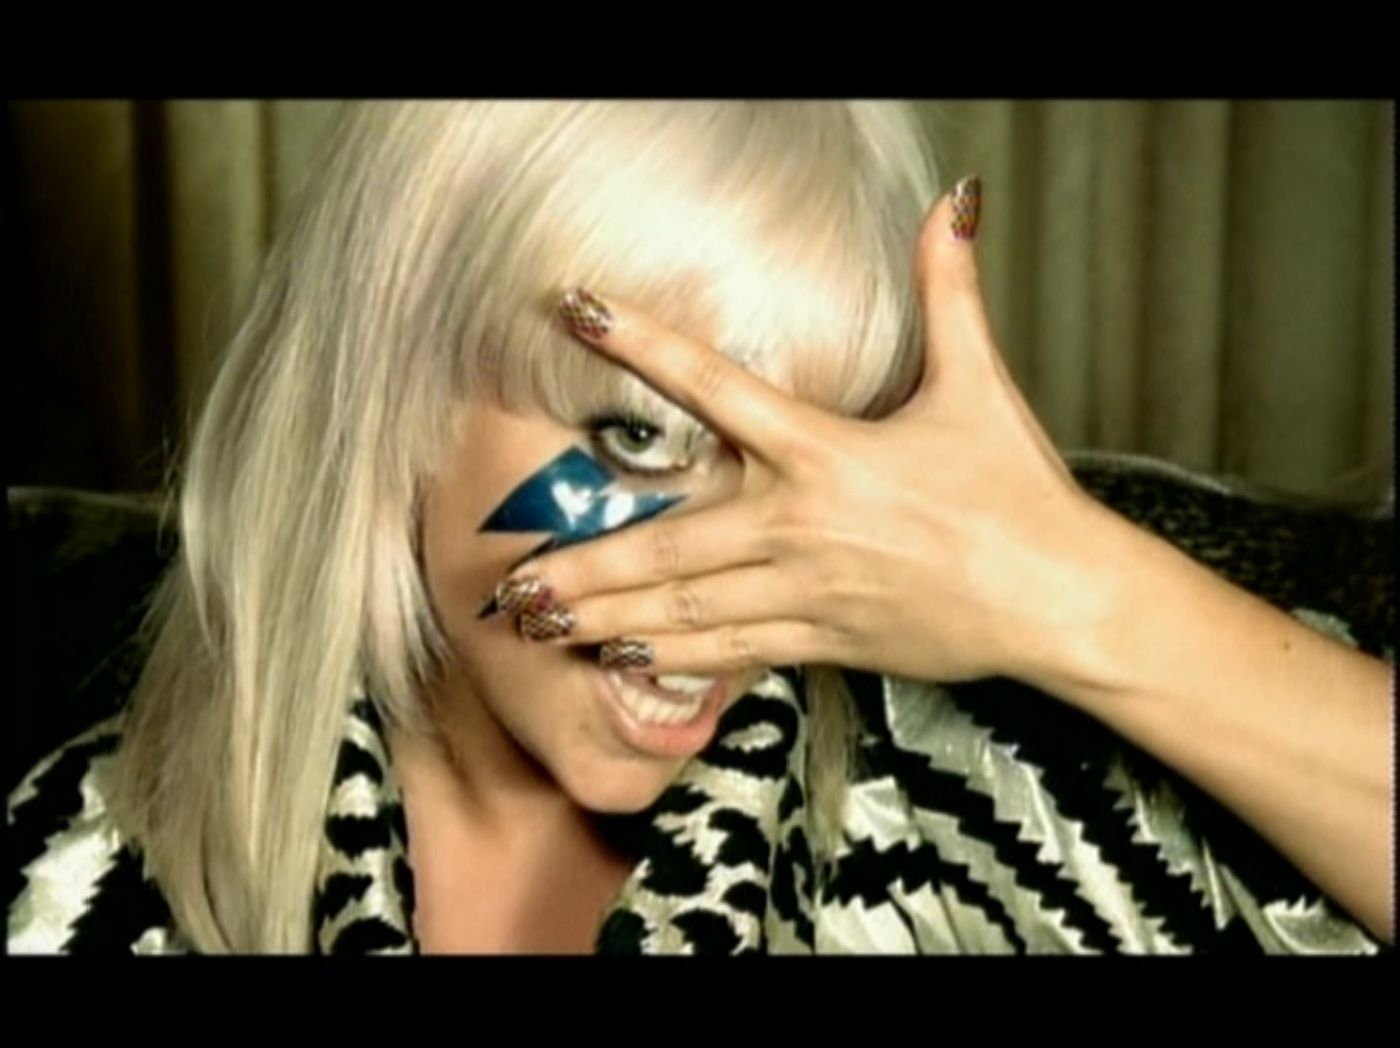 lady gaga - Just Dance - music video - Lady Gaga Image ... Lady Gaga Songs